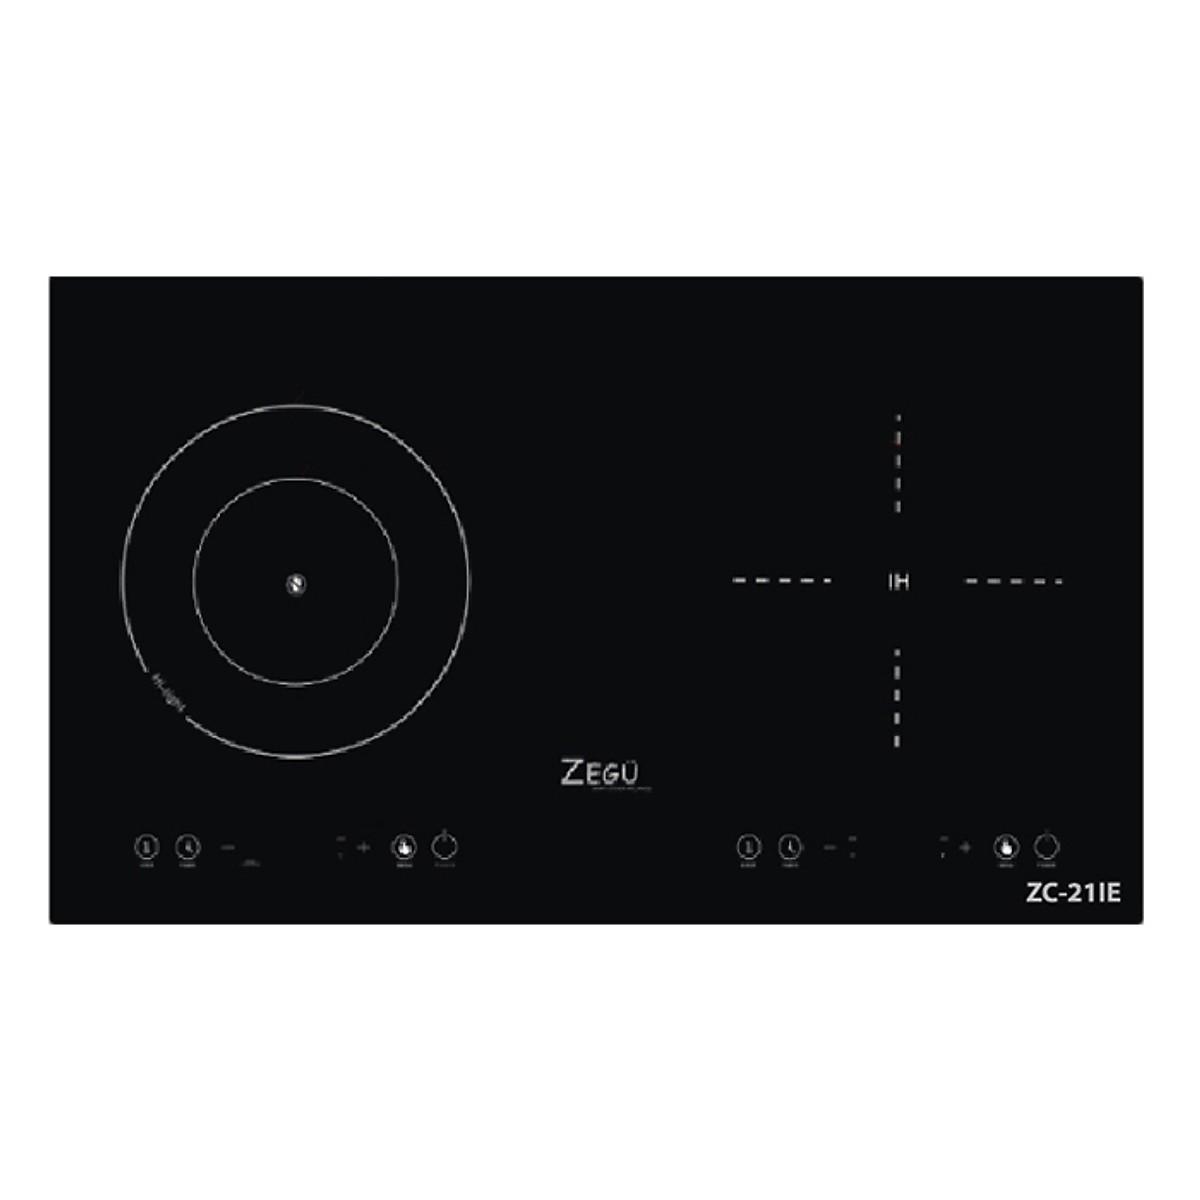 Bếp Từ Hồng Ngoại Kết Hợp Zegu ZC-21IE